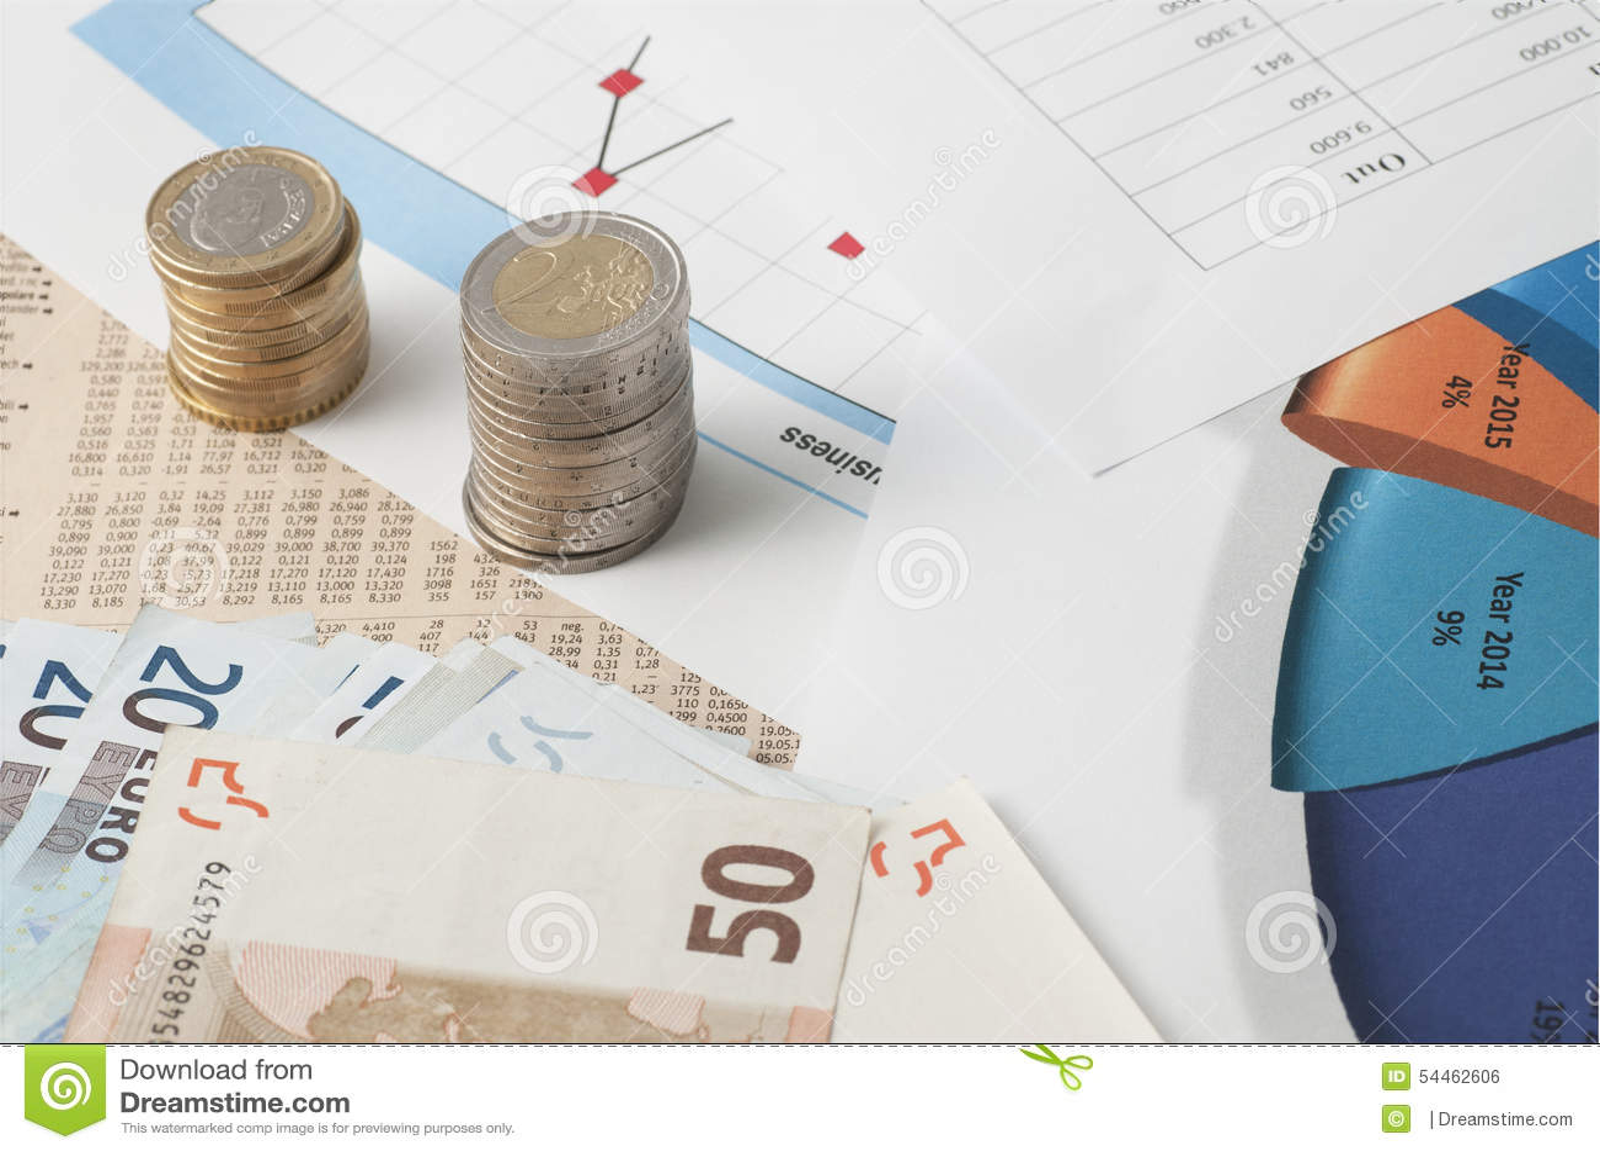 Stock market calculator.